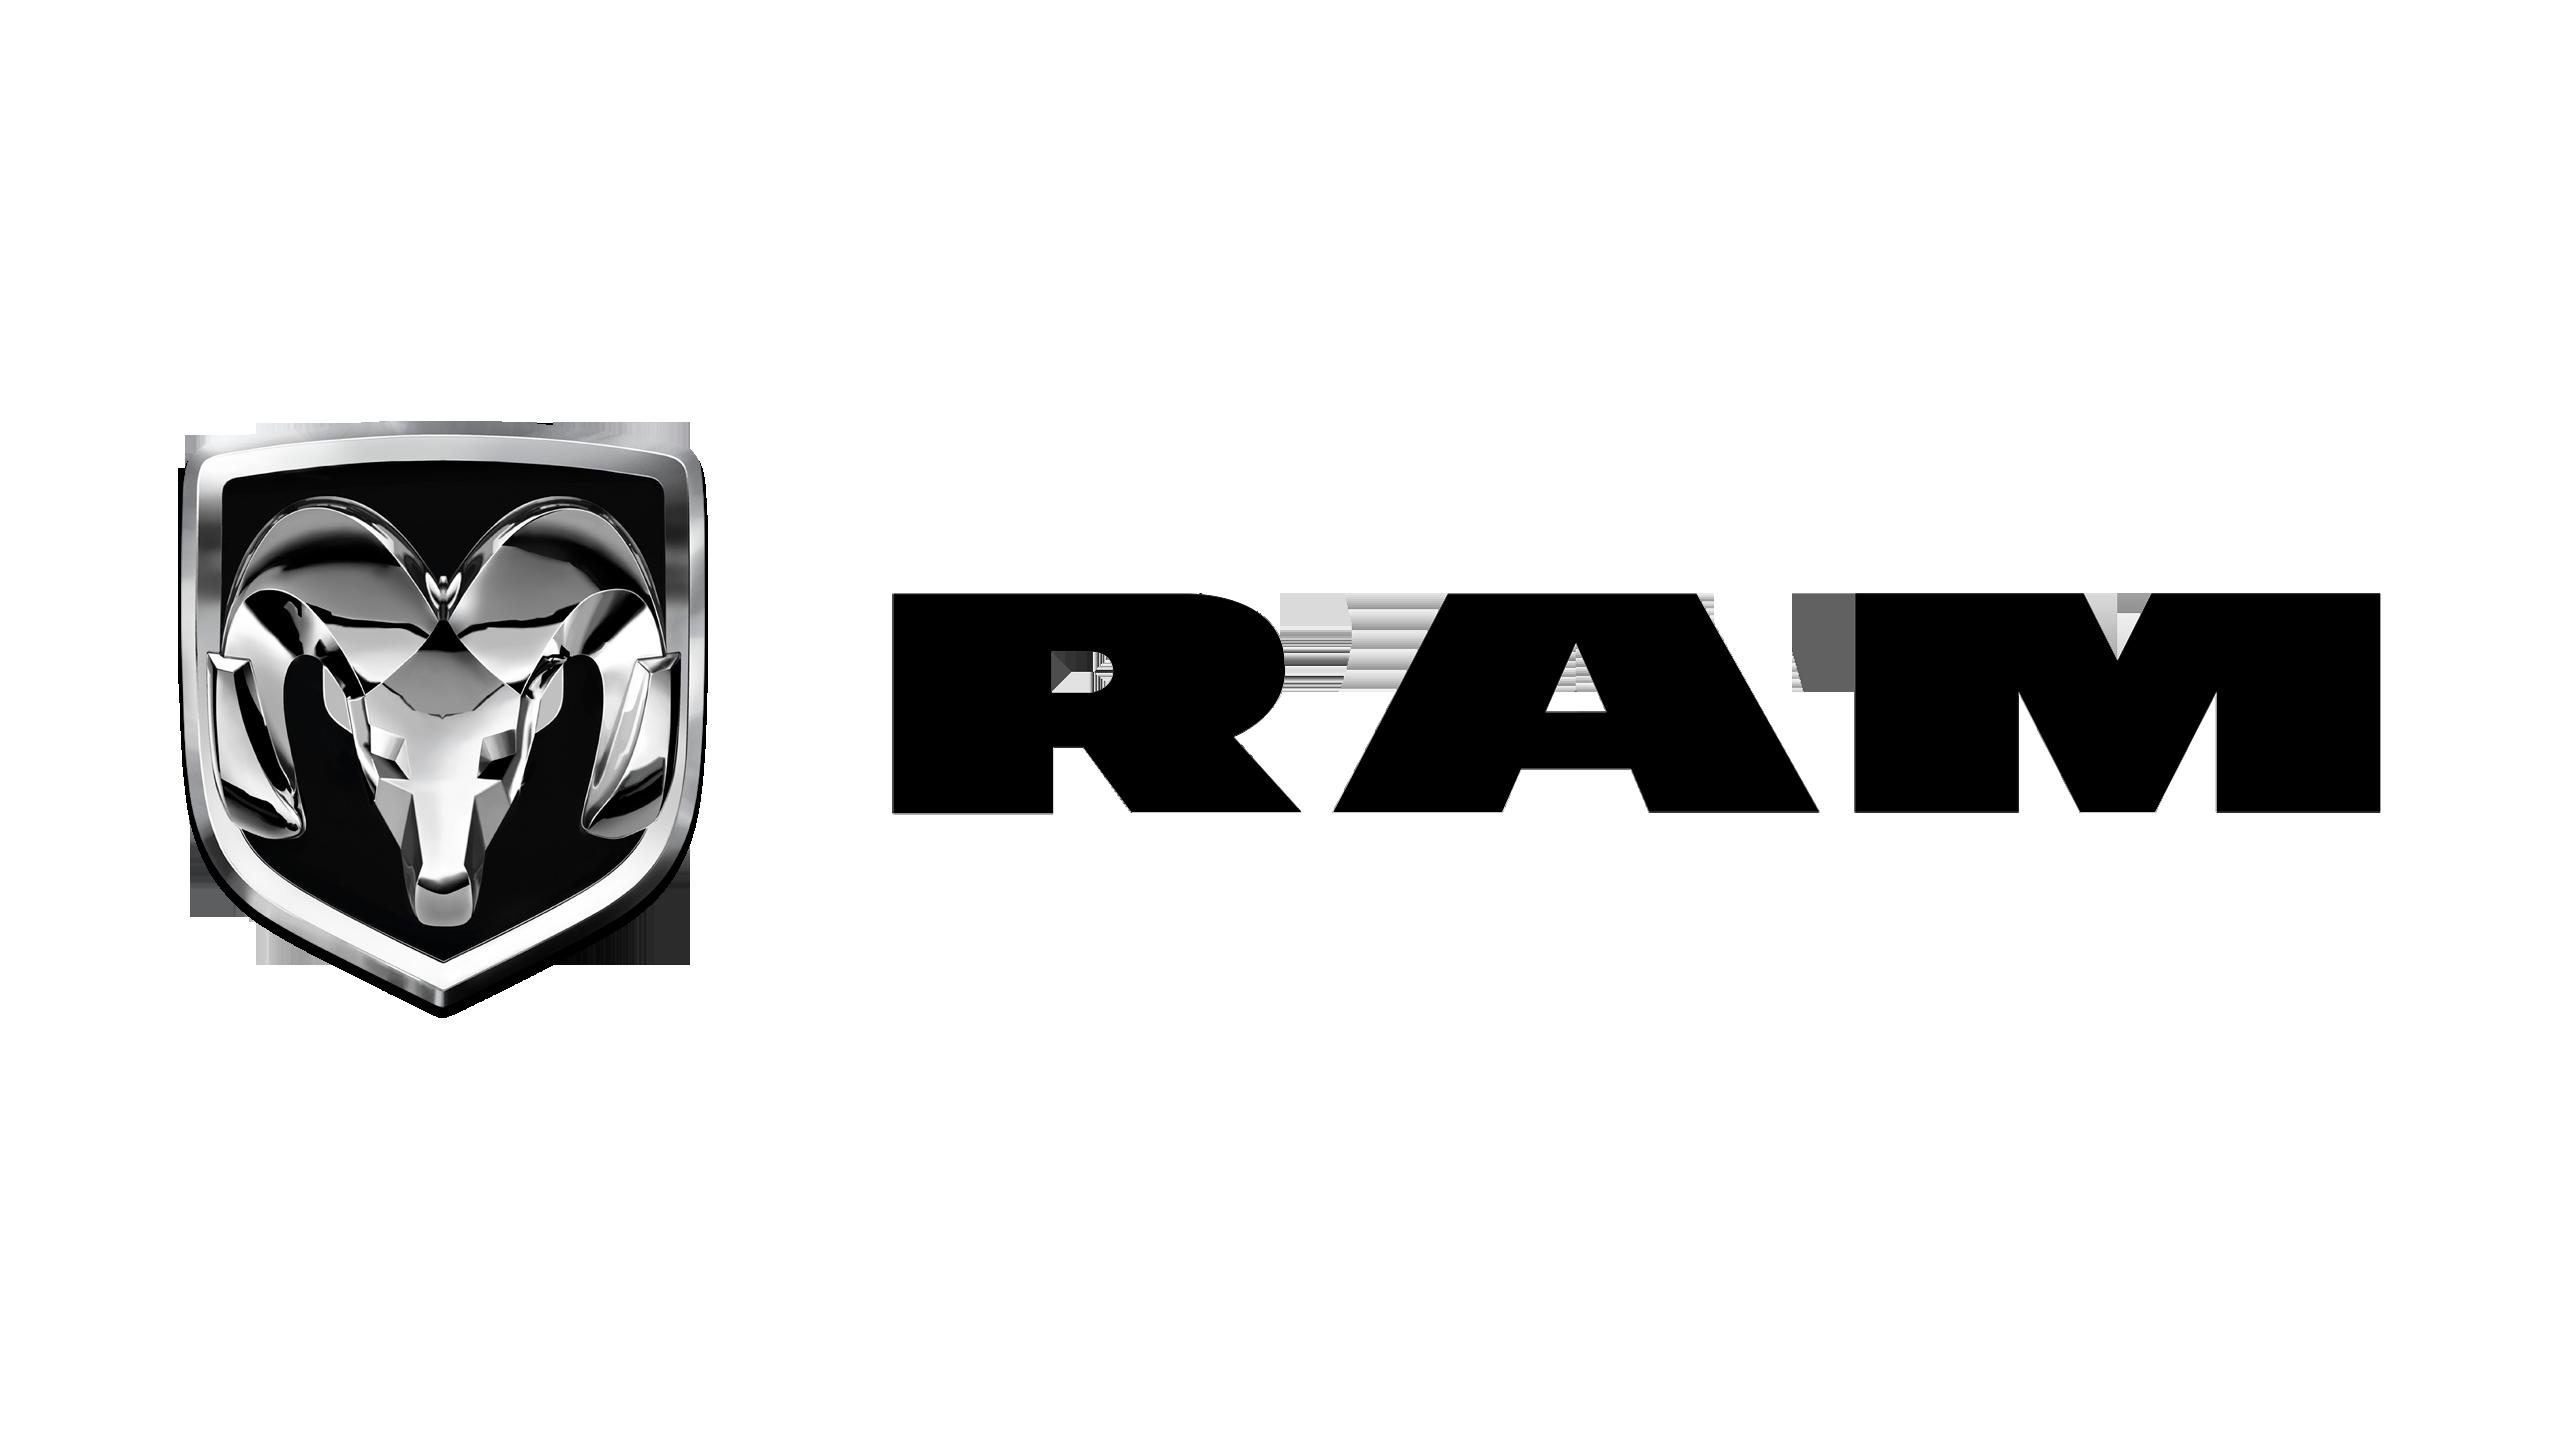 Ram Trucks Logo Hd Png Meaning Information